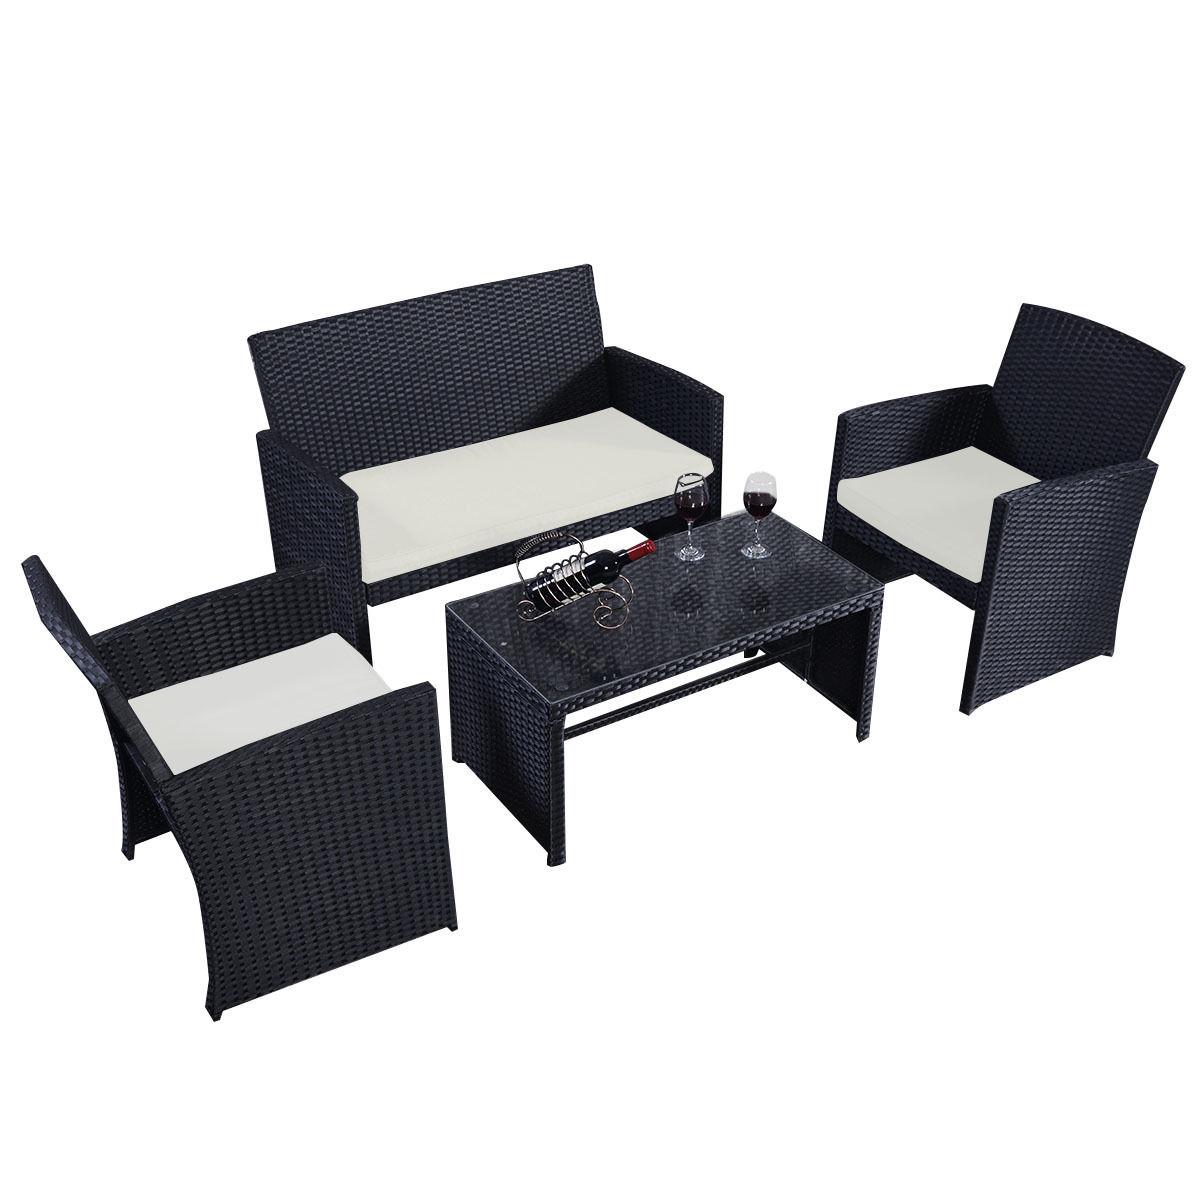 Costway 4 Pc Rattan Patio Furniture Set Garden Lawn Sofa Wicker Cushioned Seat Black 3